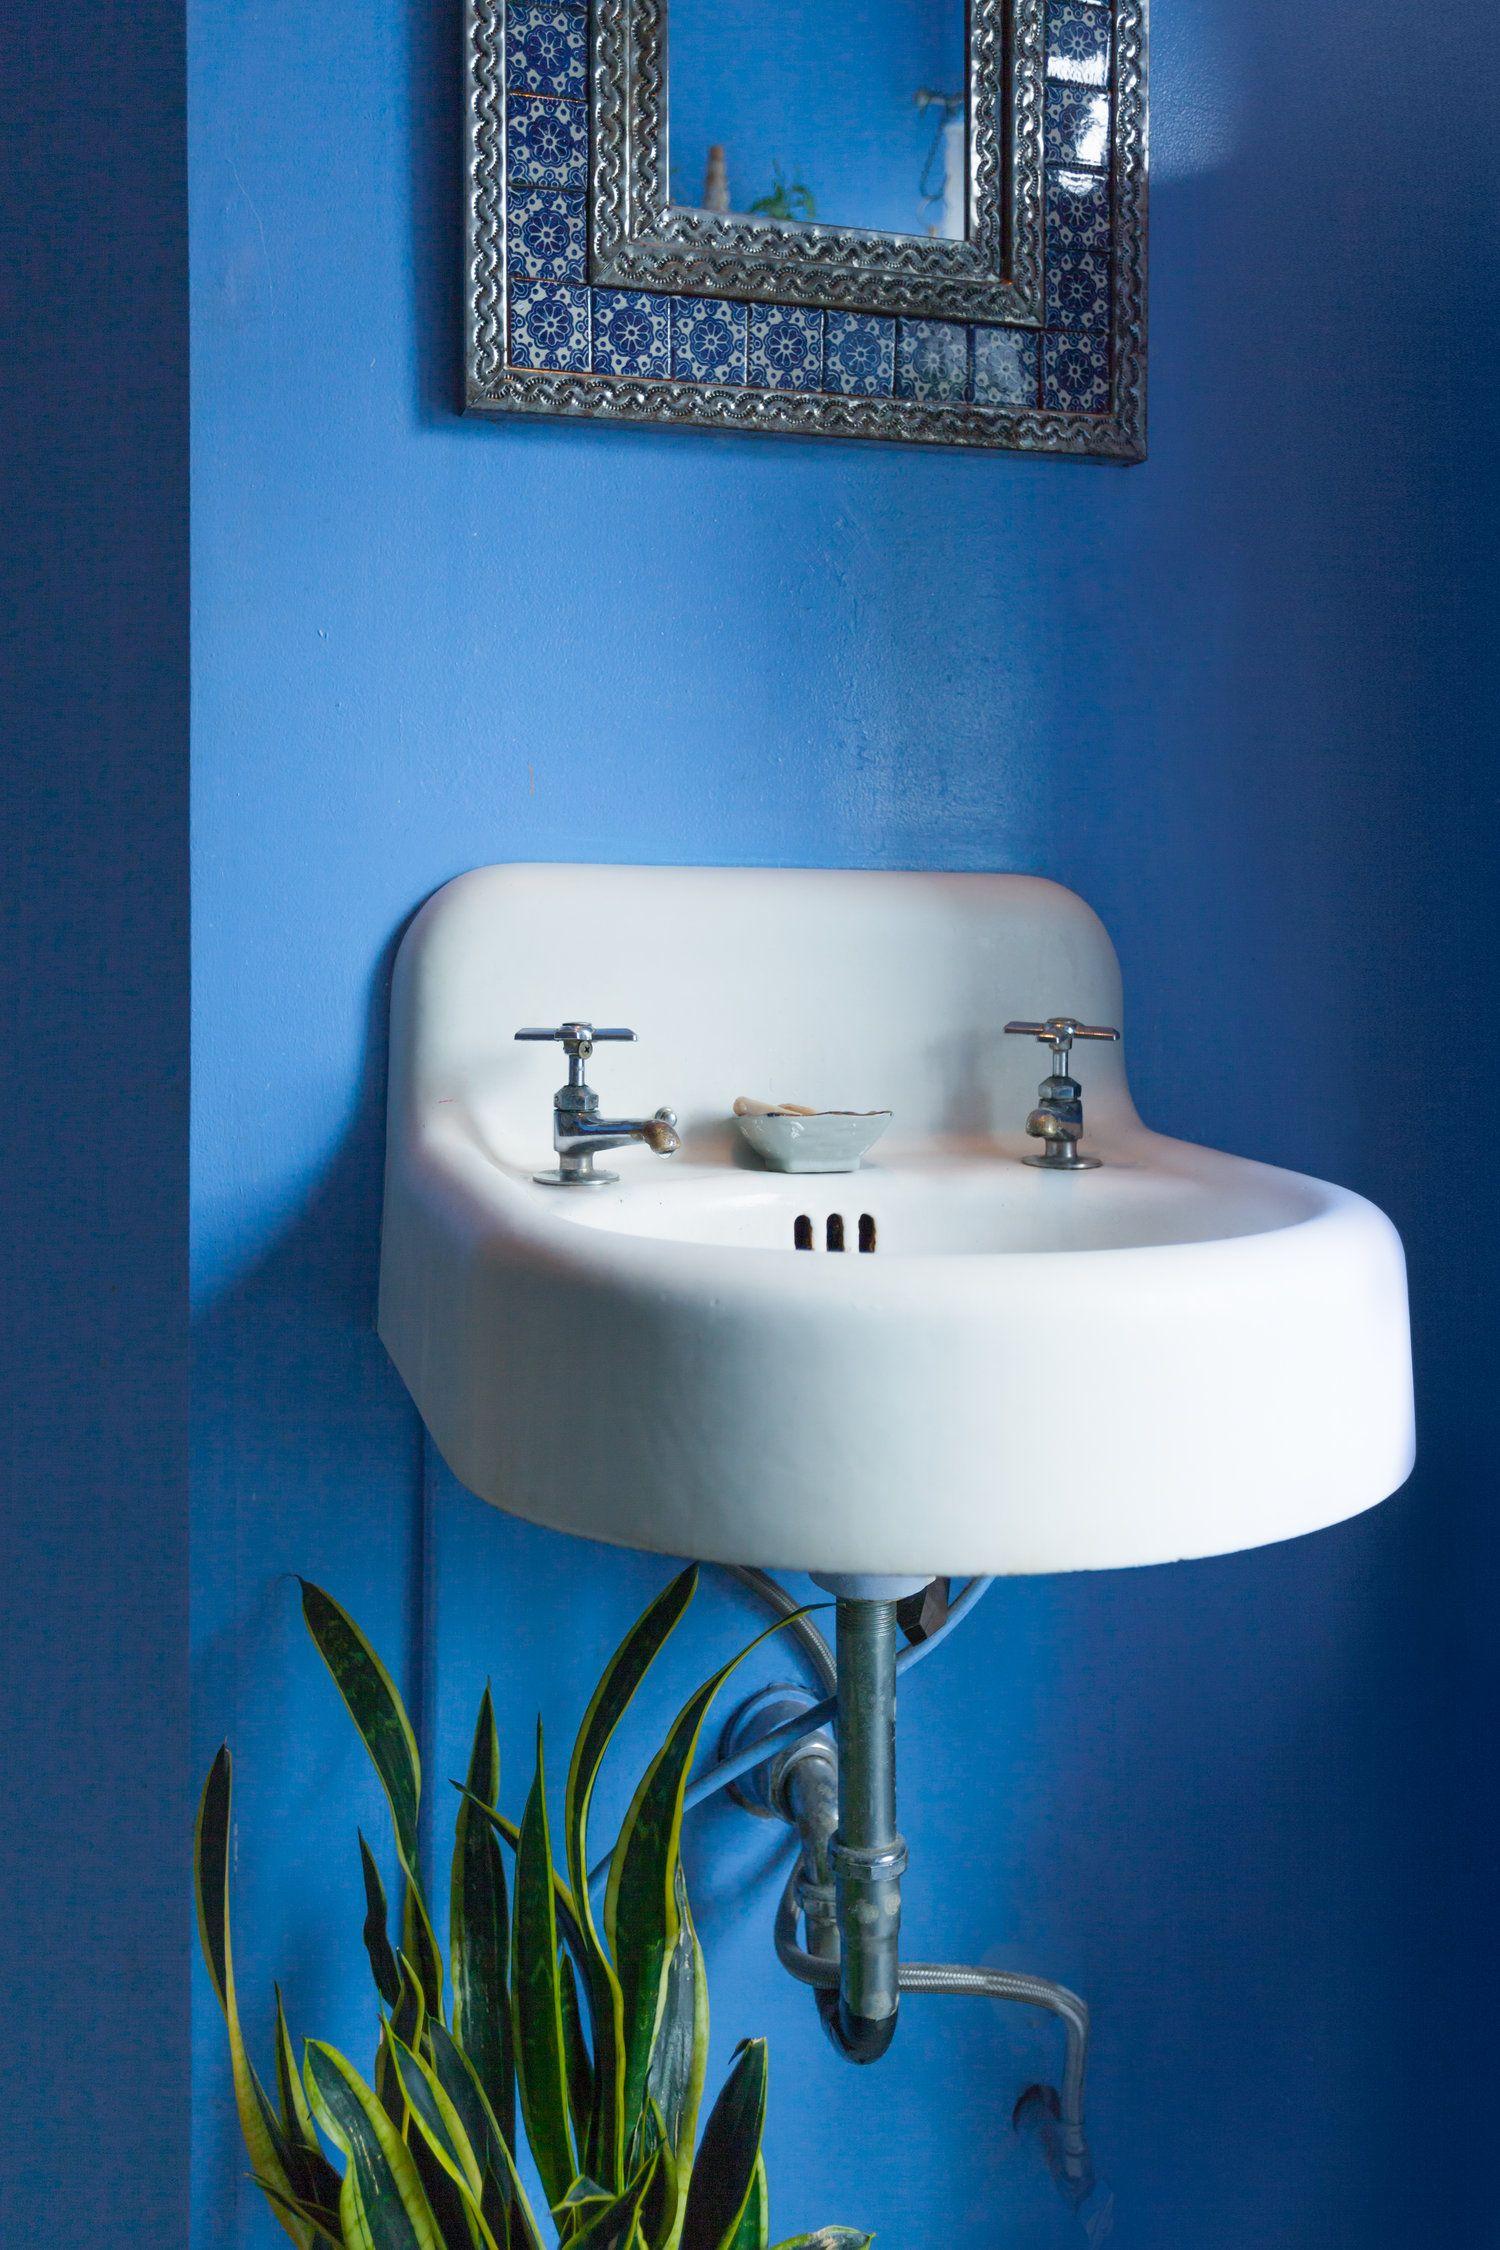 A Sansevieria trifasciata sits below my bathroom sink, obstructing on security sink snake, plumbing snake, glass snake, toilet snake, best sink snake, sink drain snake, bathroom drain snake, garden snake,